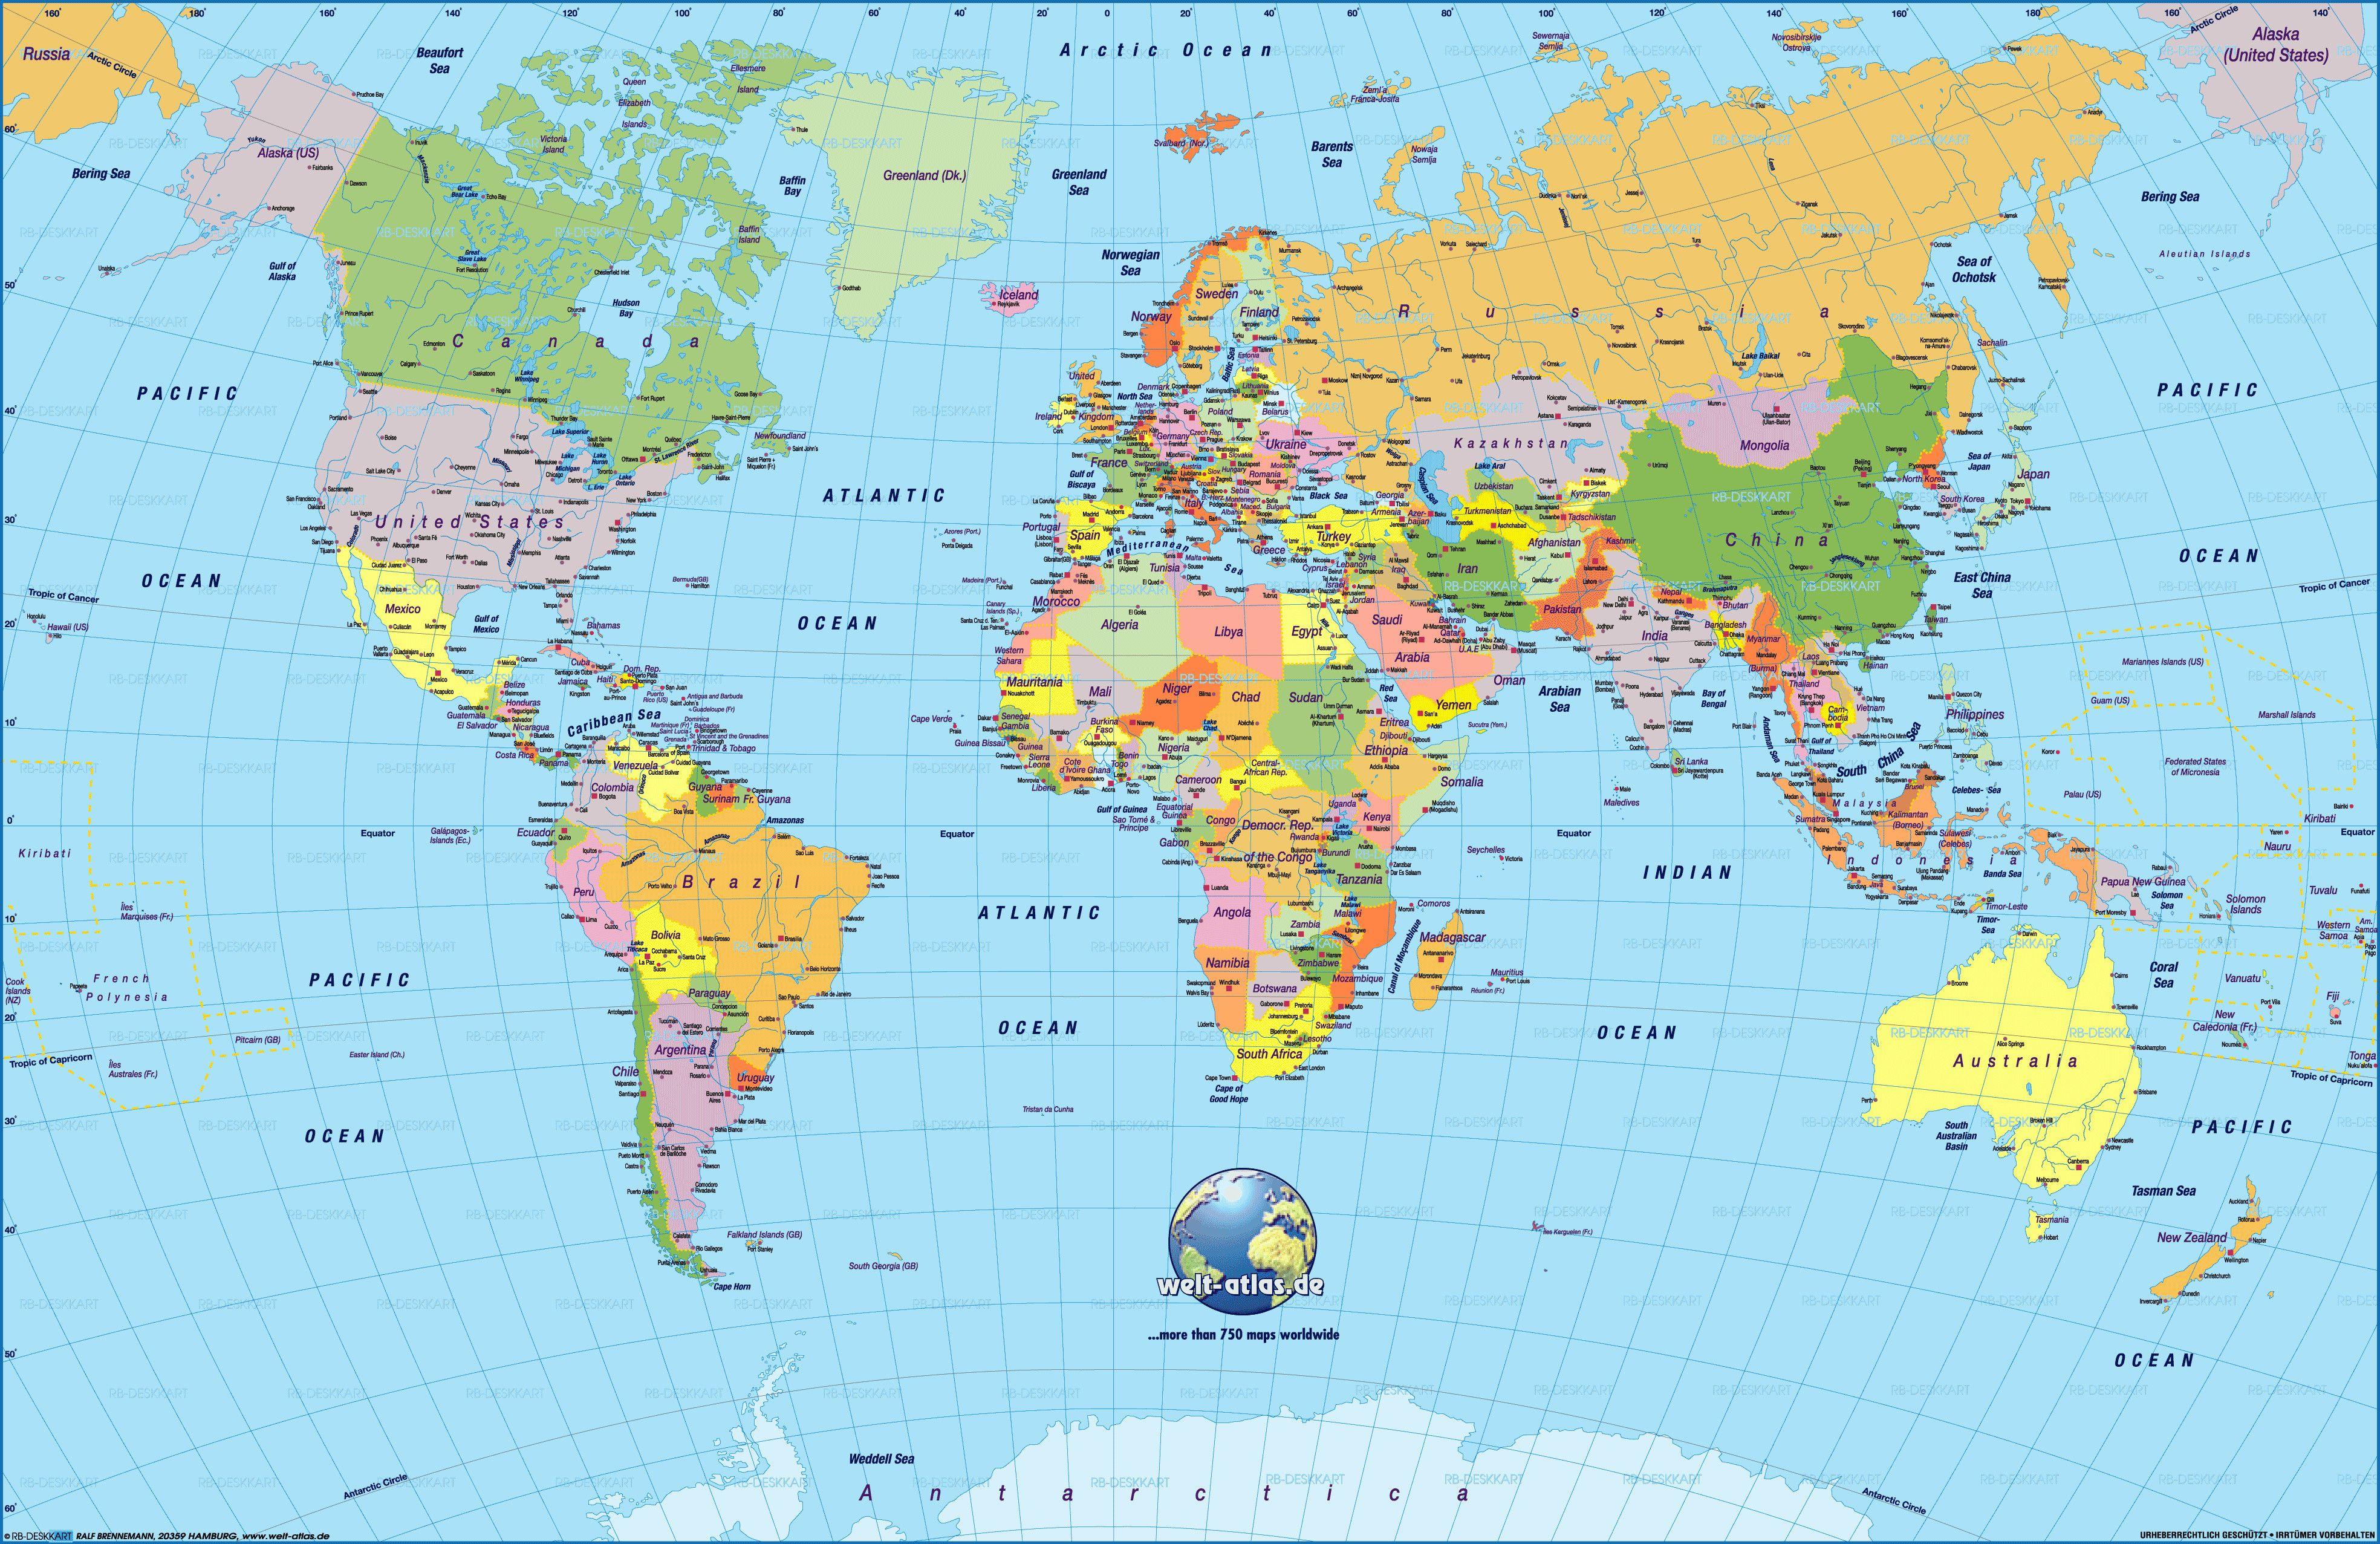 Cool World Map Pdf 2 | Maps | Pinterest | Free Printable World Map - Free Printable World Map Pdf